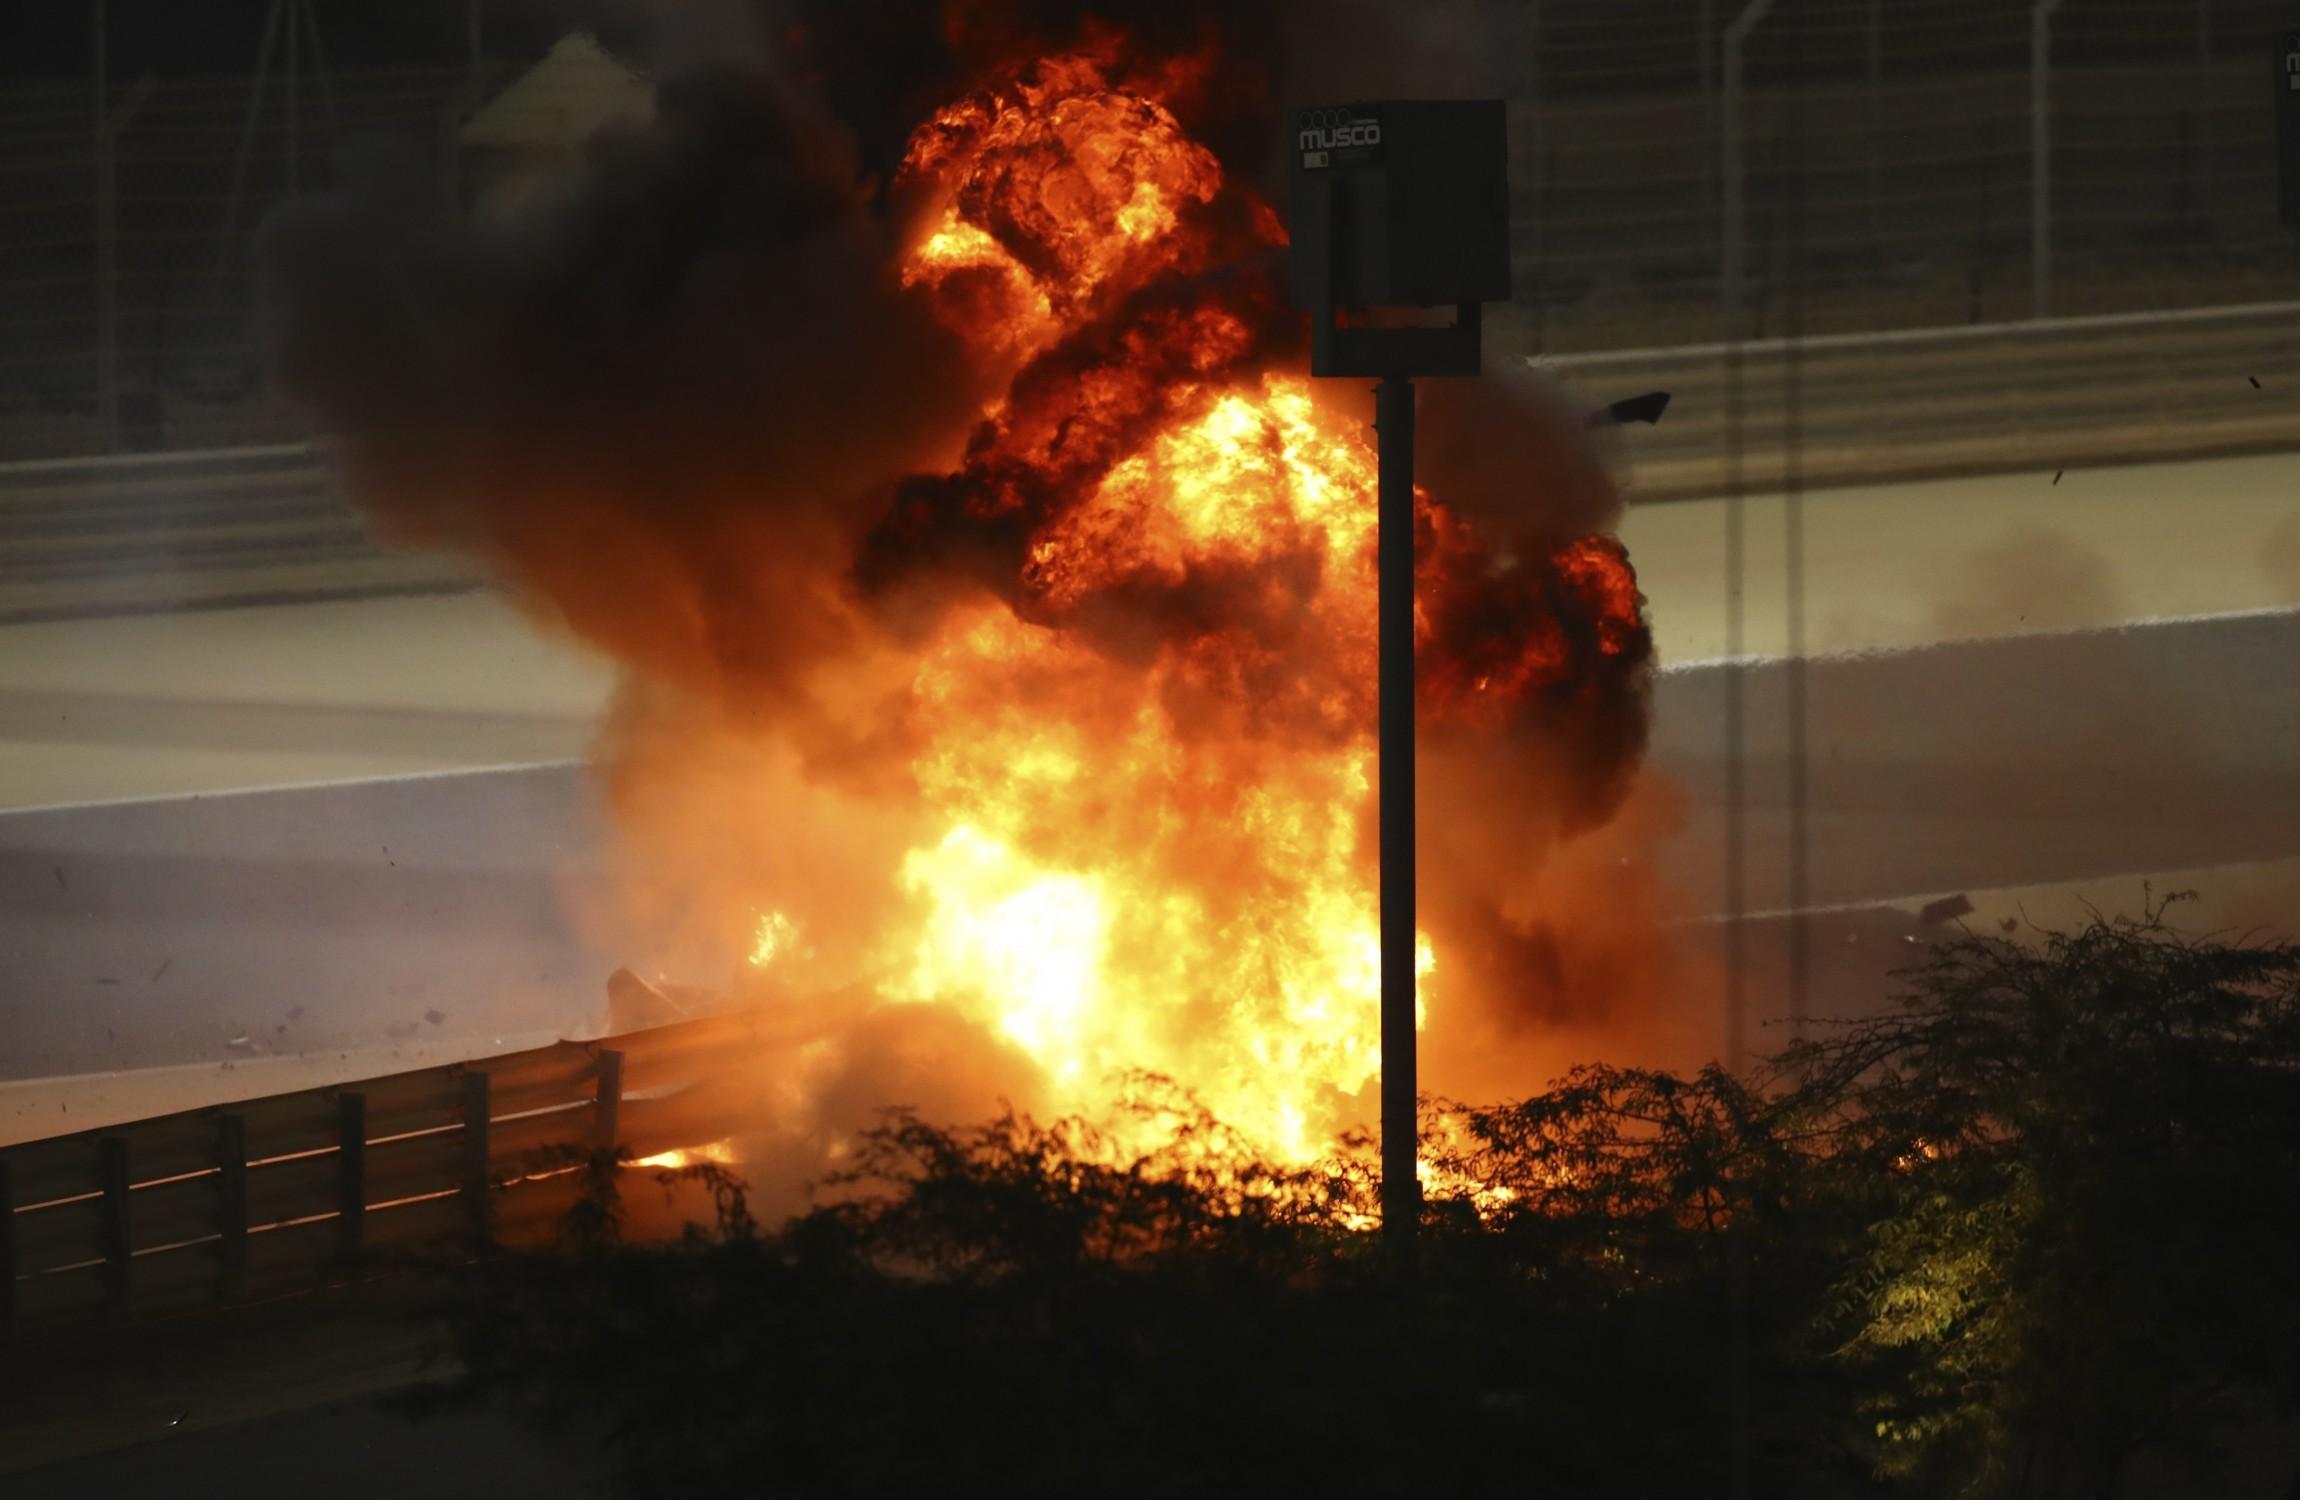 Haas driver Romain Grosjean escapes after horror crash at Bahrain Grand Prix